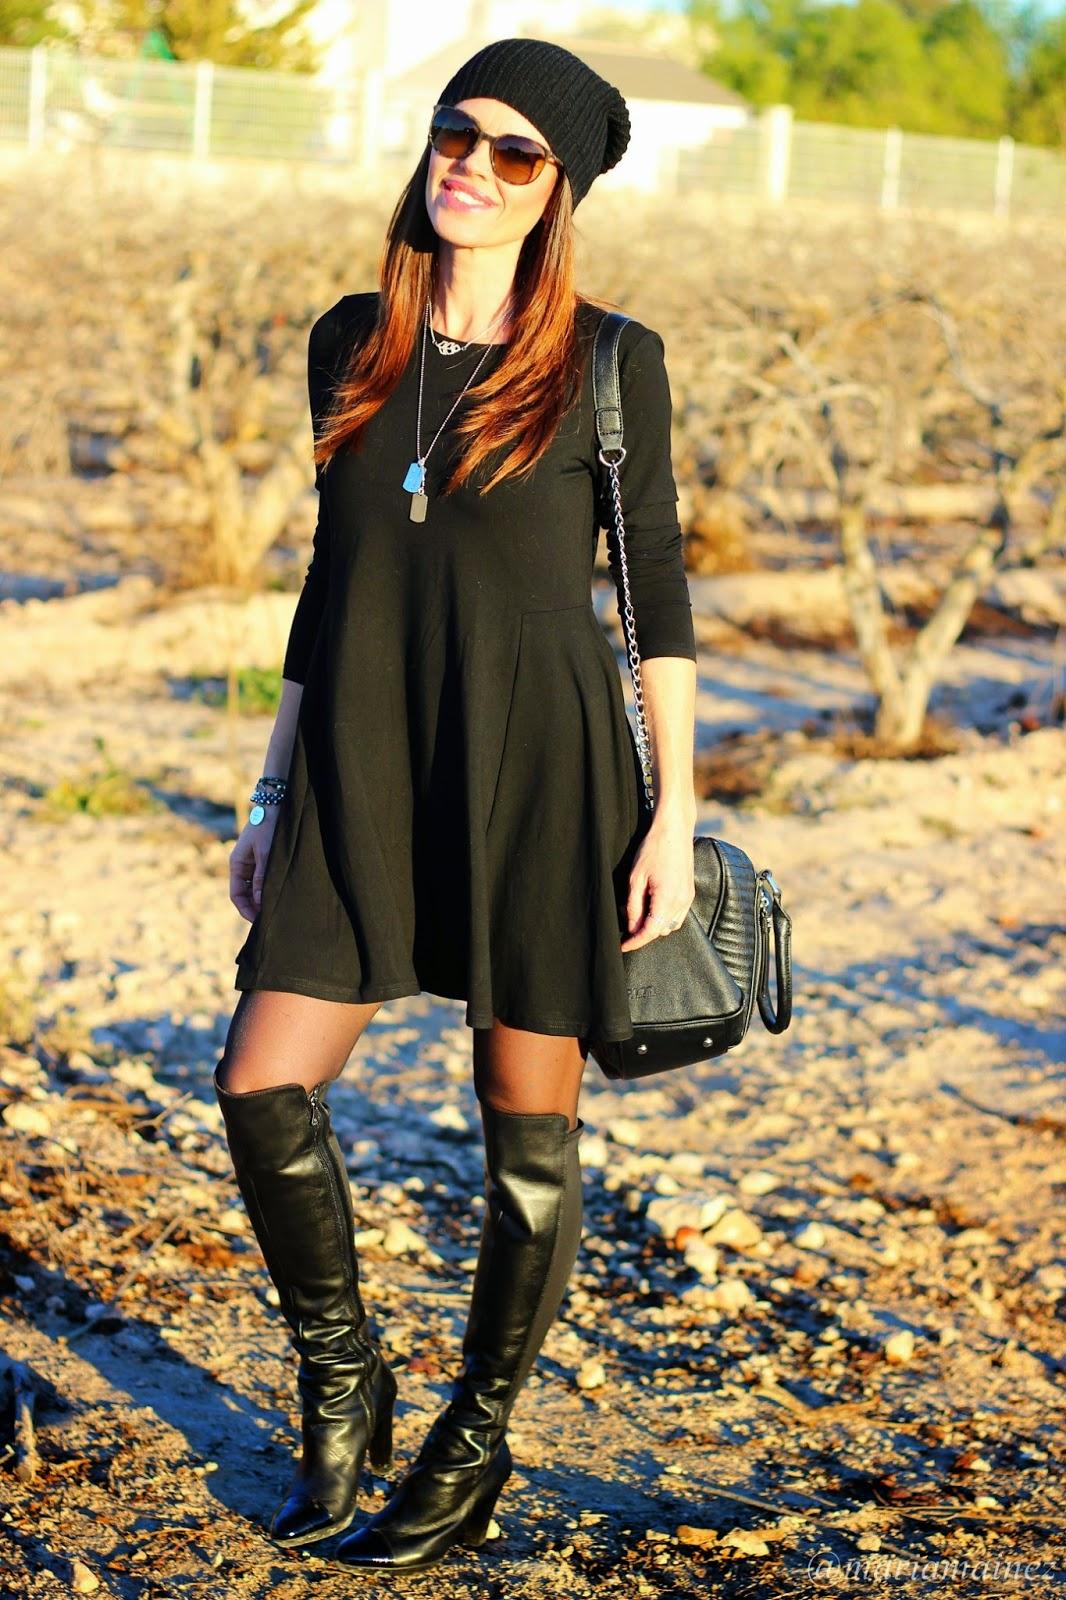 Vestido corto negro Sheinside - Bolso Pepe Moll - Botas Altas Dansi - Blogger Alicante